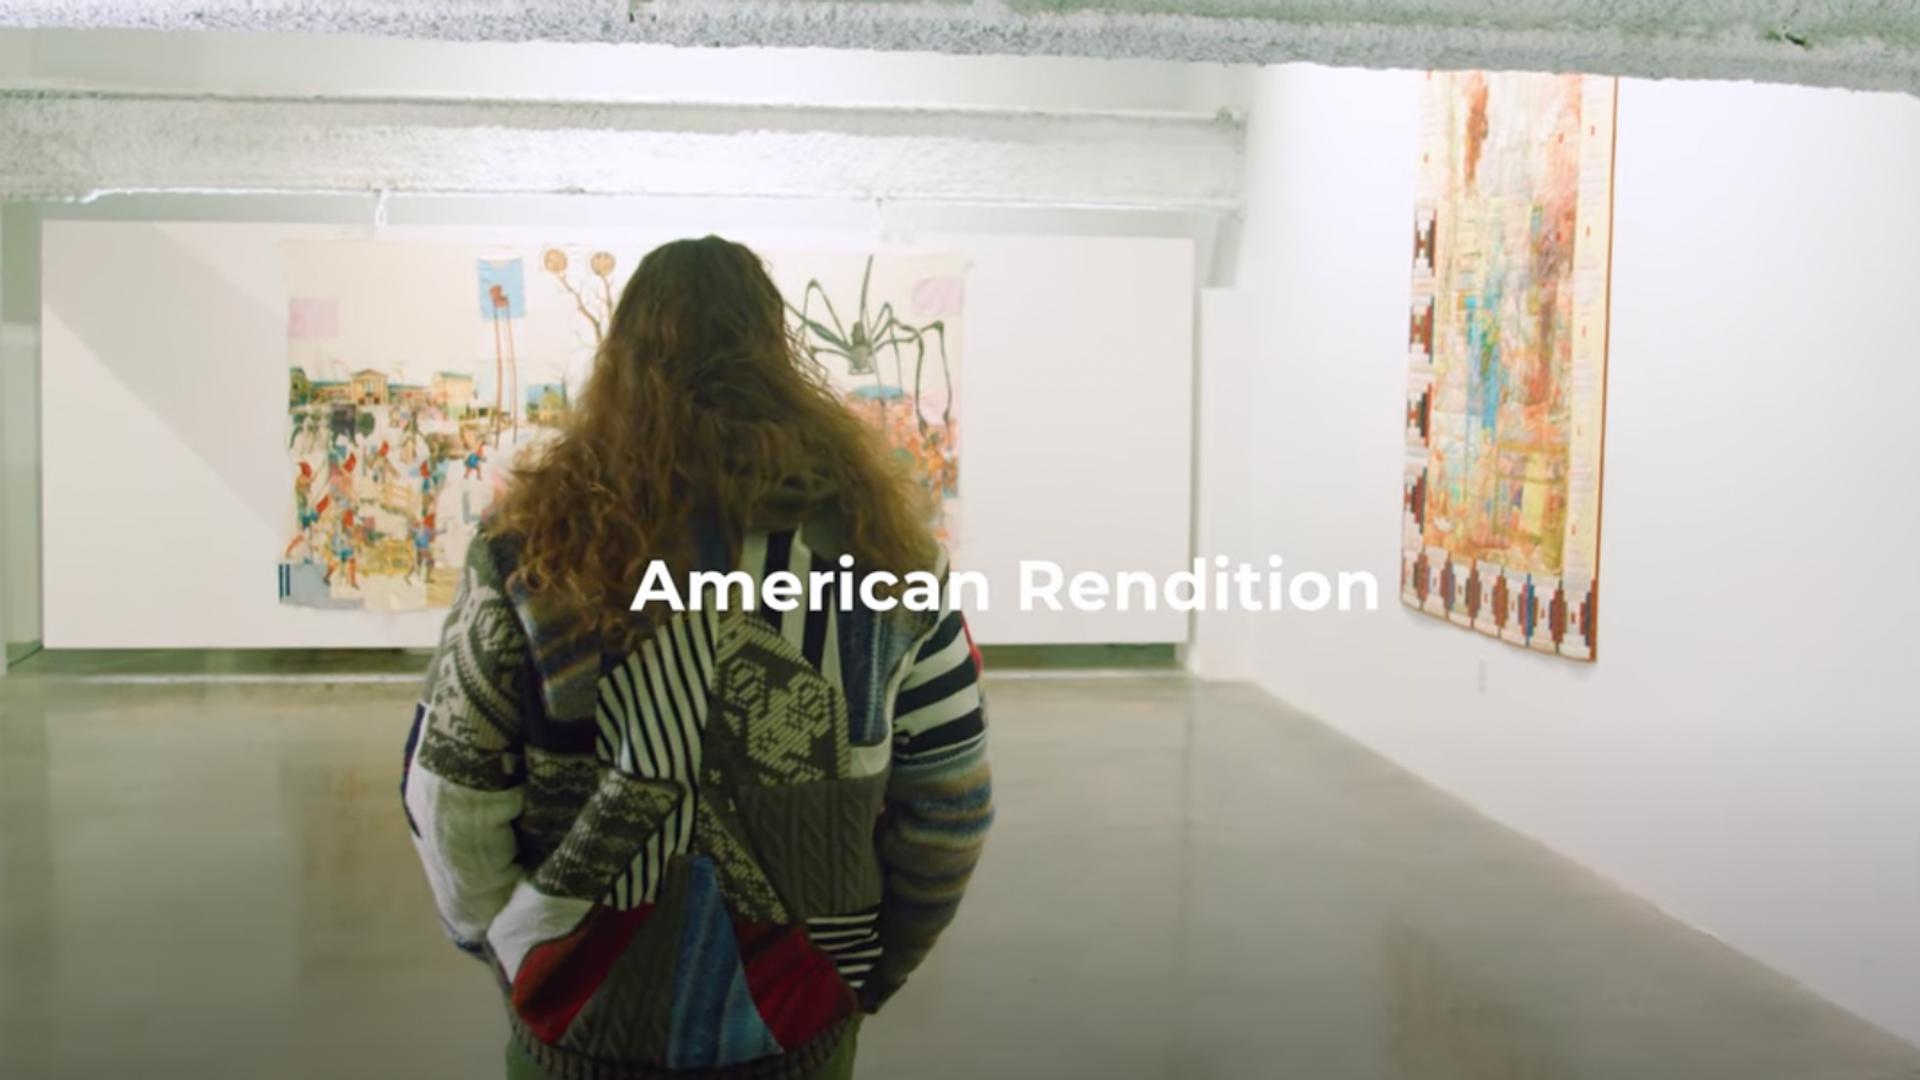 American Rendition (video)